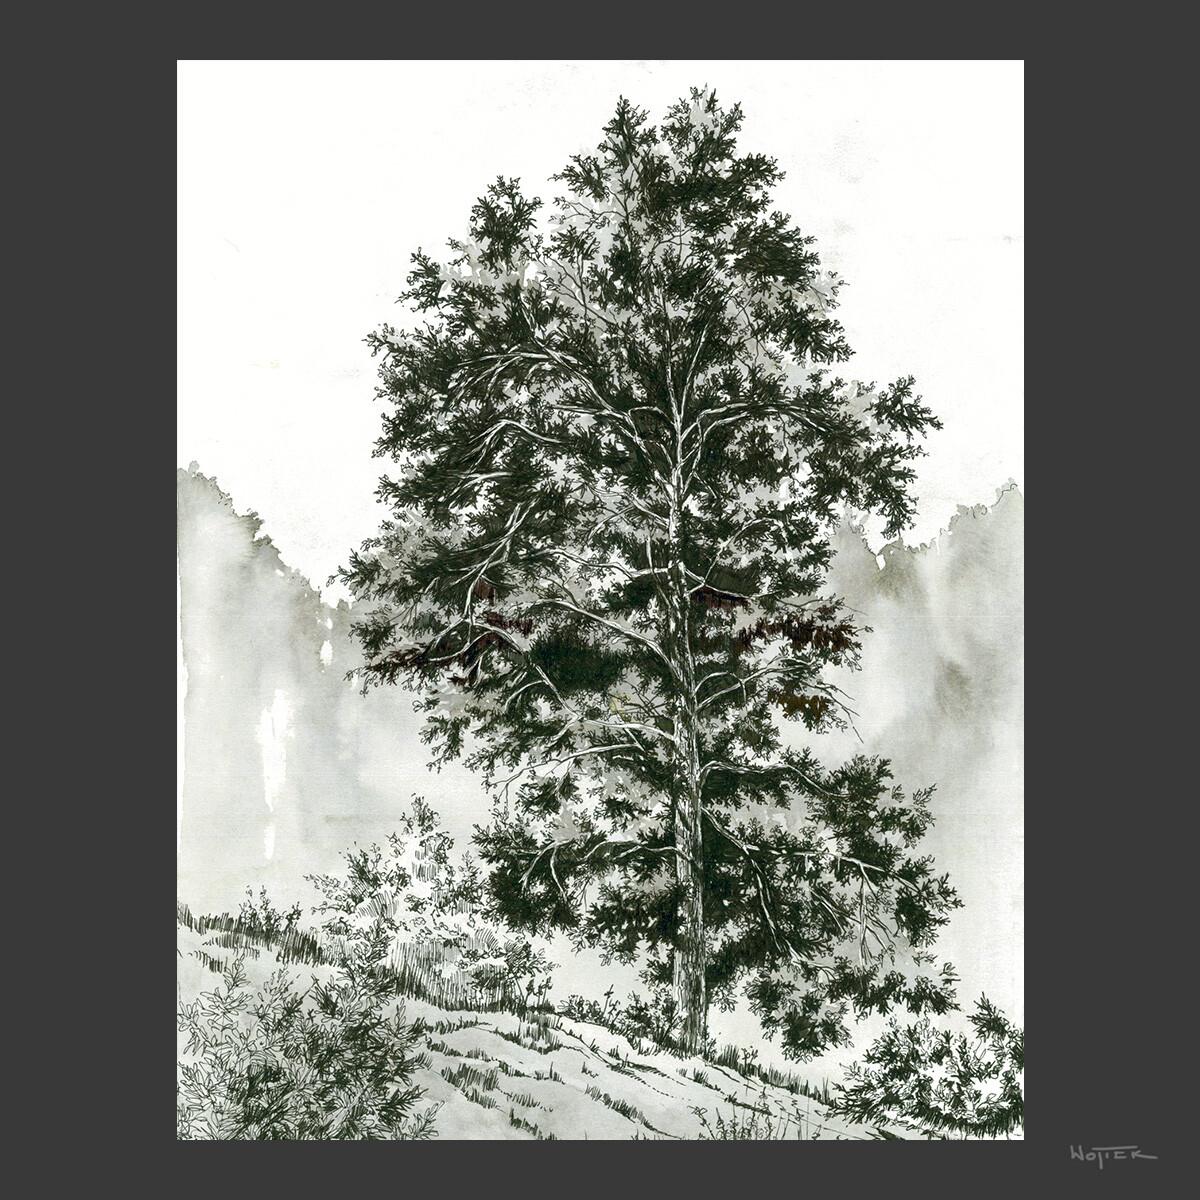 Sketches #02 - Tree Studies